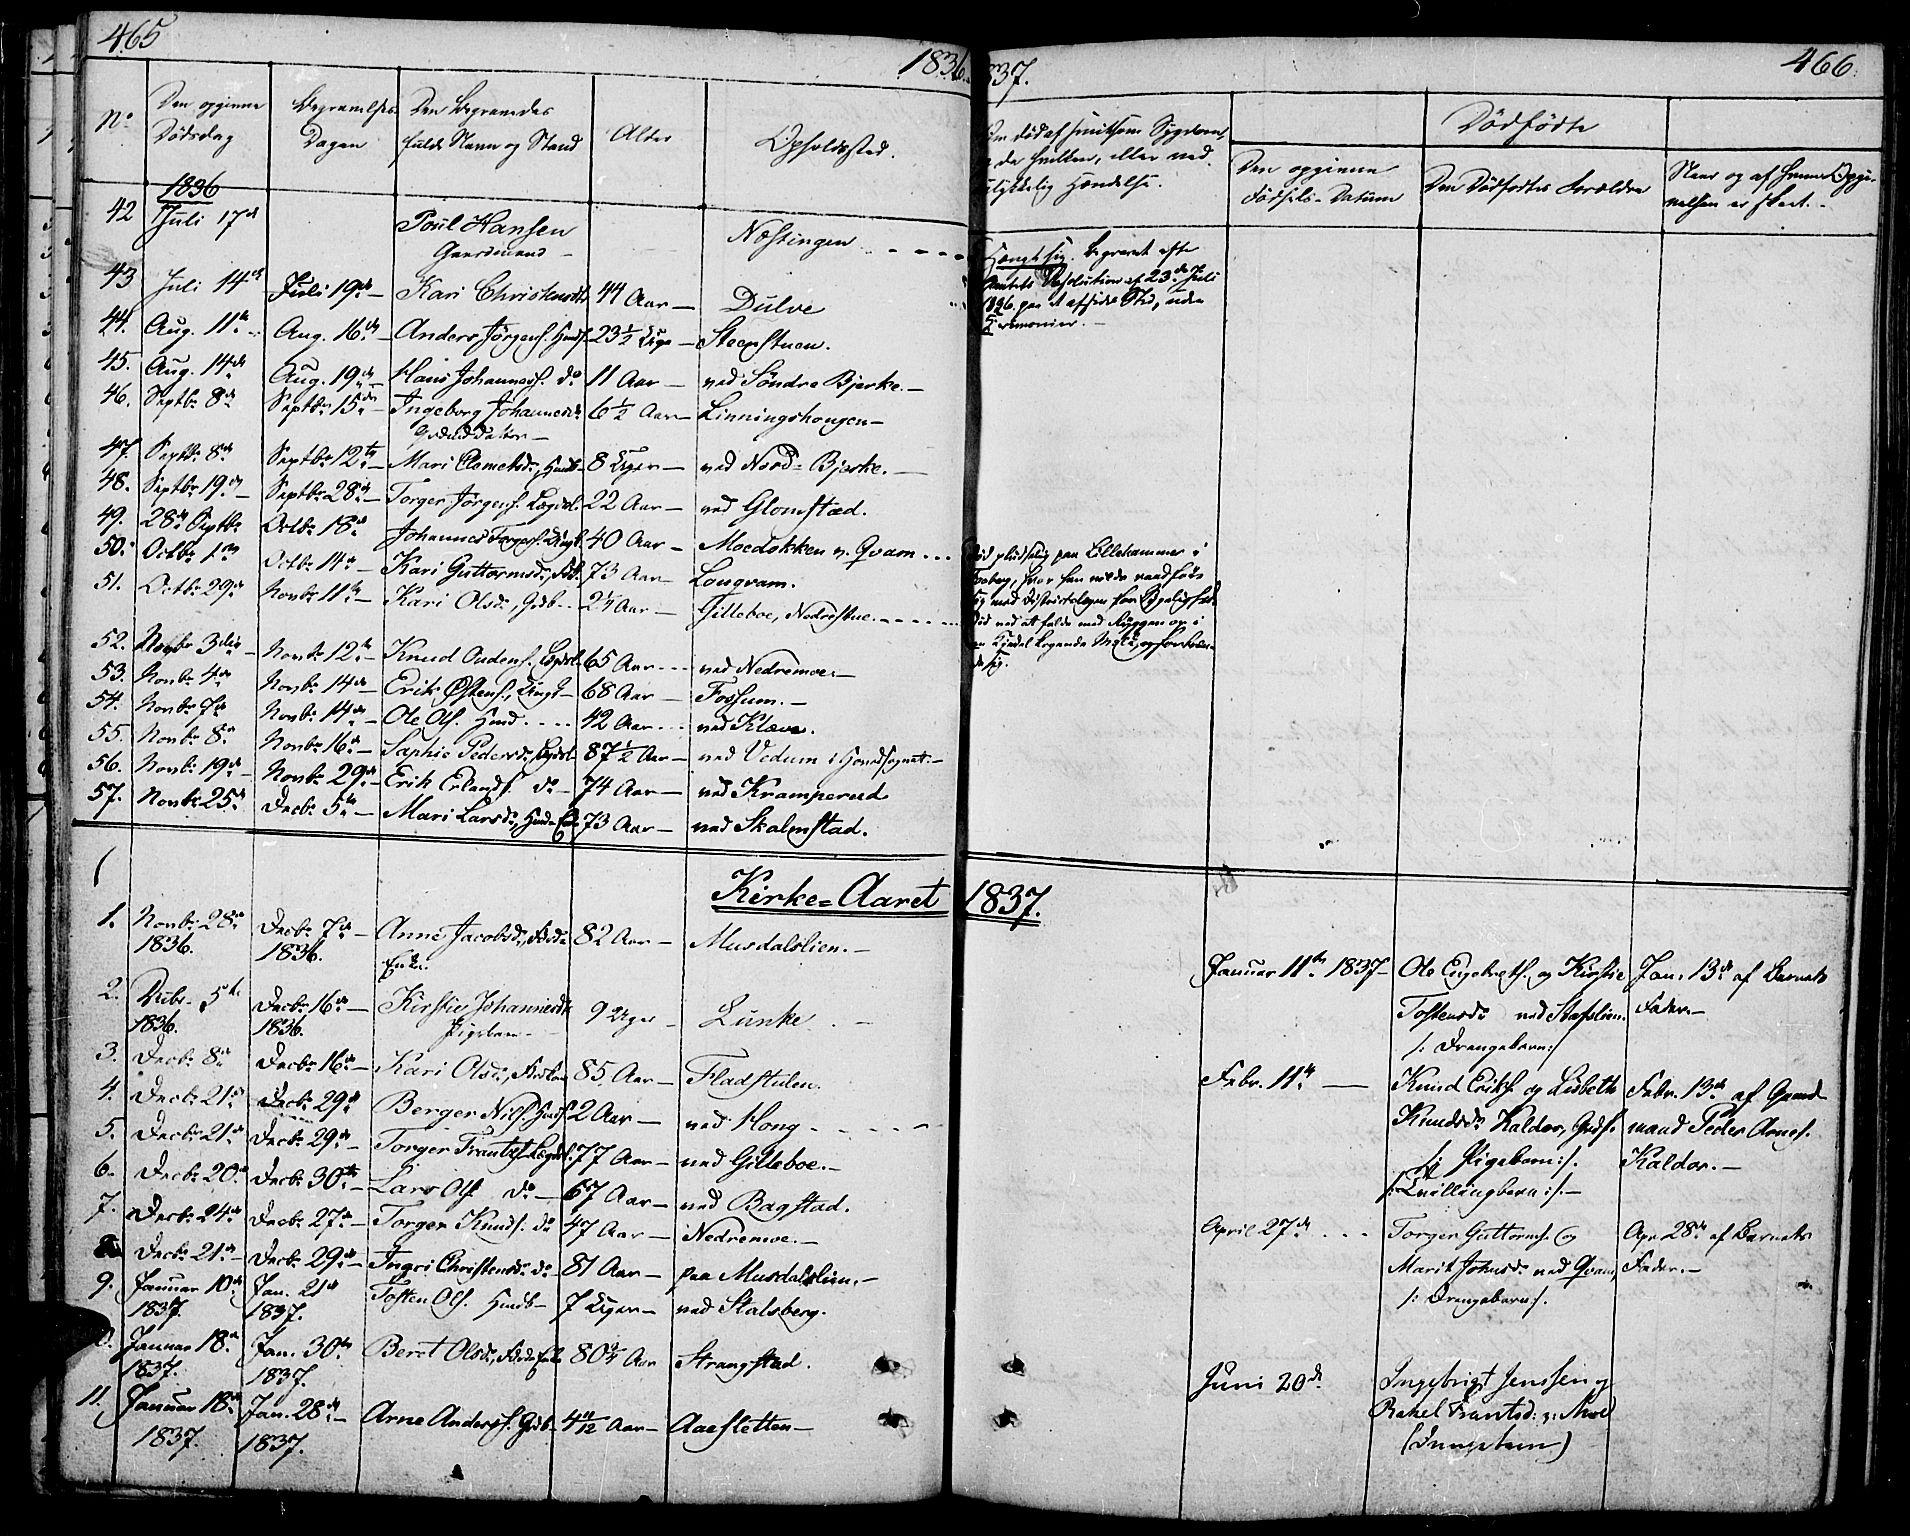 SAH, Øyer prestekontor, Ministerialbok nr. 4, 1824-1841, s. 465-466